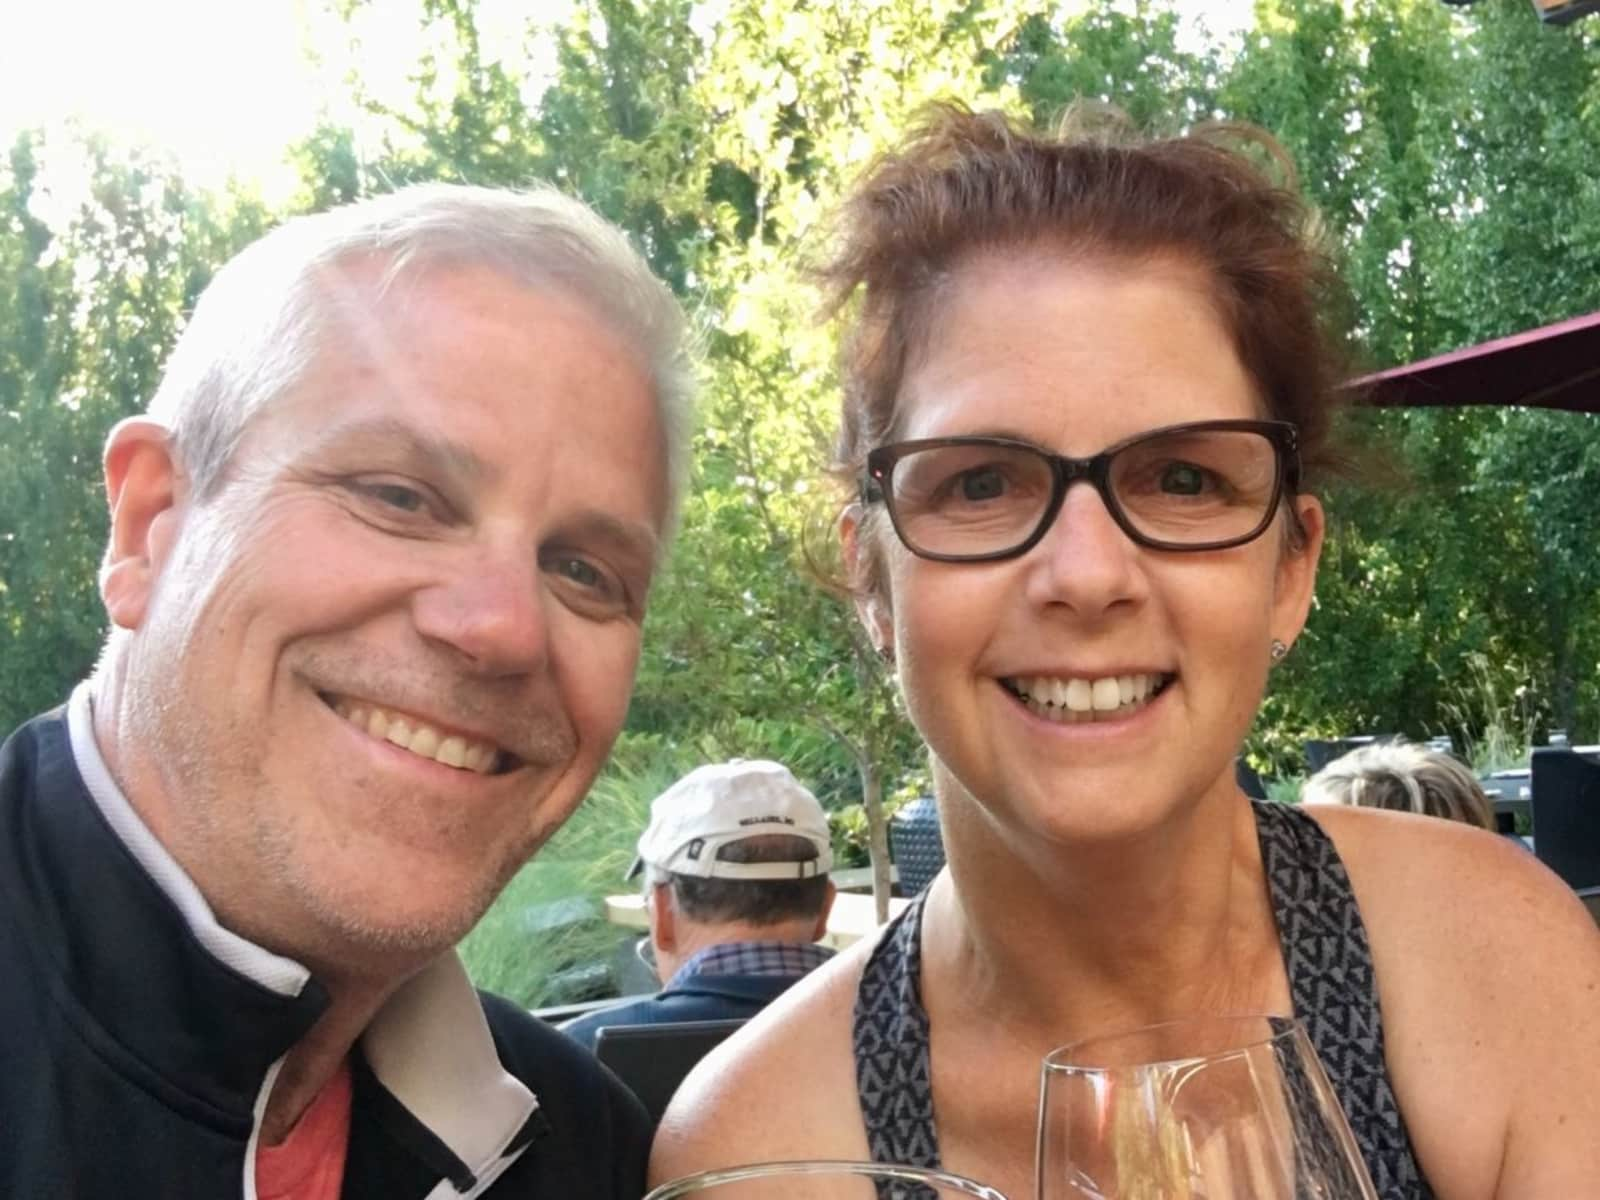 Cathy & Rick from Manchester, Washington, United States